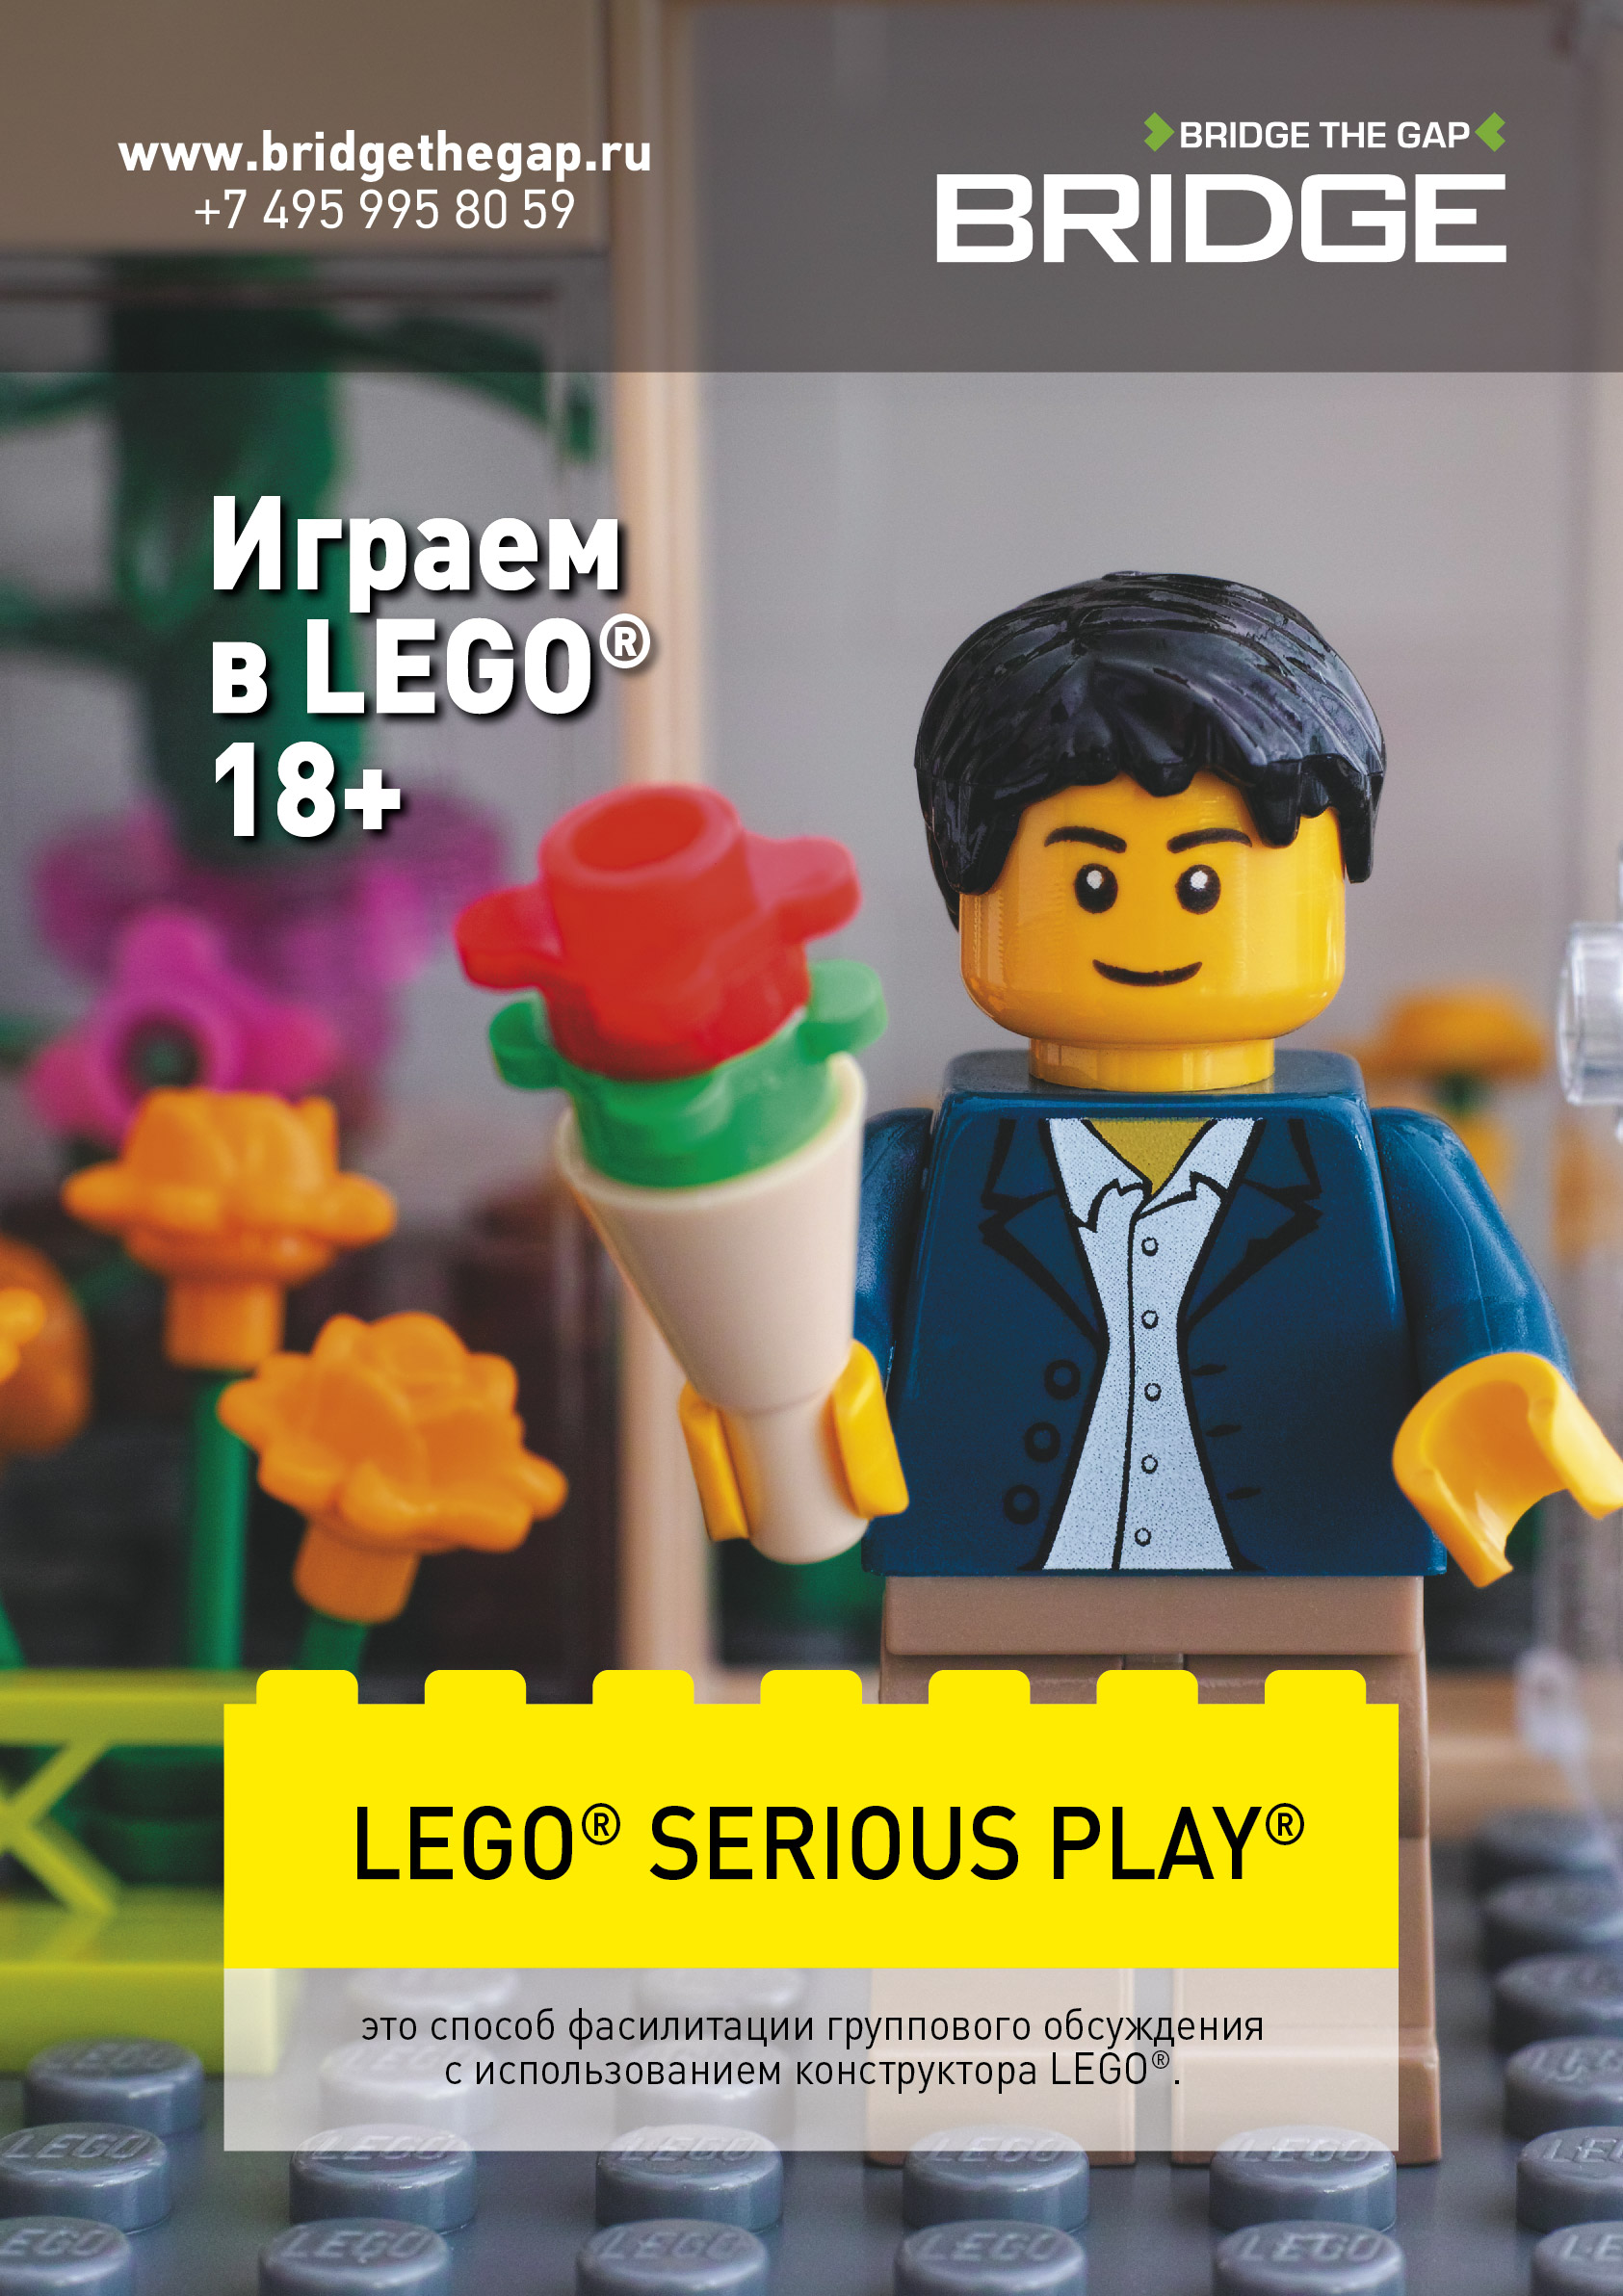 ЗНАКОМСТВО С МЕТОДОМ LEGO® SERIOUS PLAY®